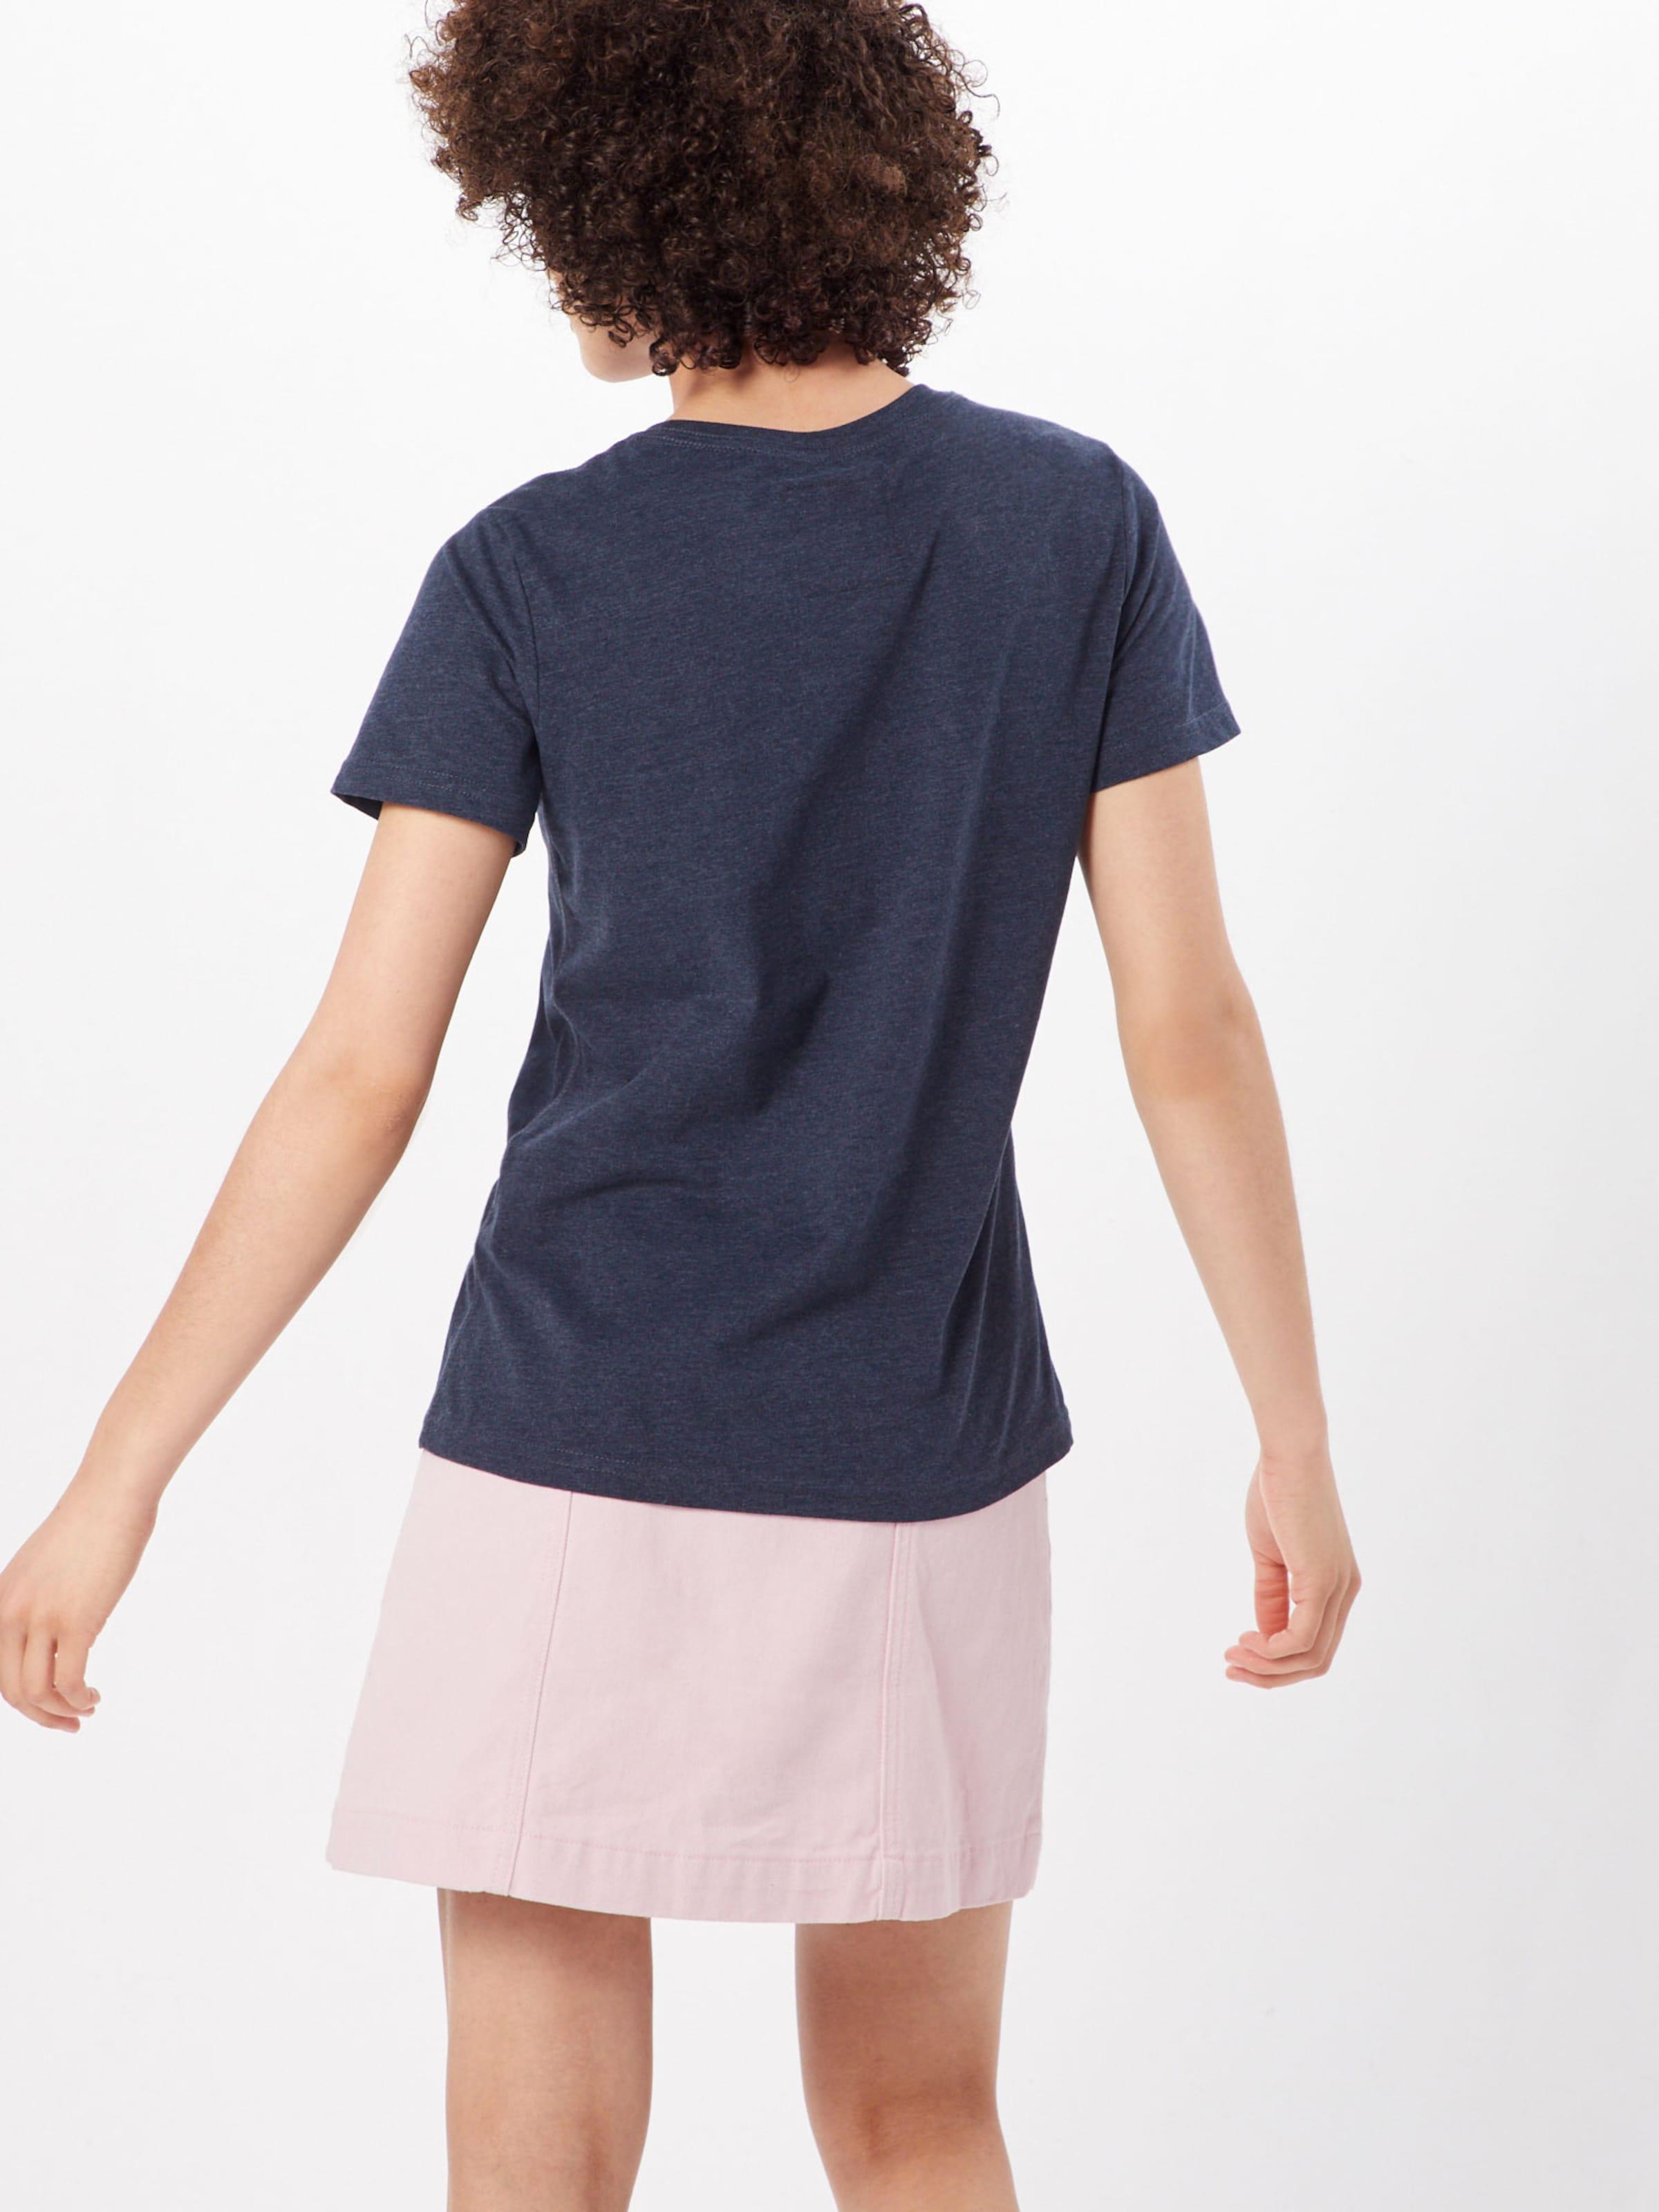 Superdry shirt En Bleu Marine T 8yvmOn0Nw